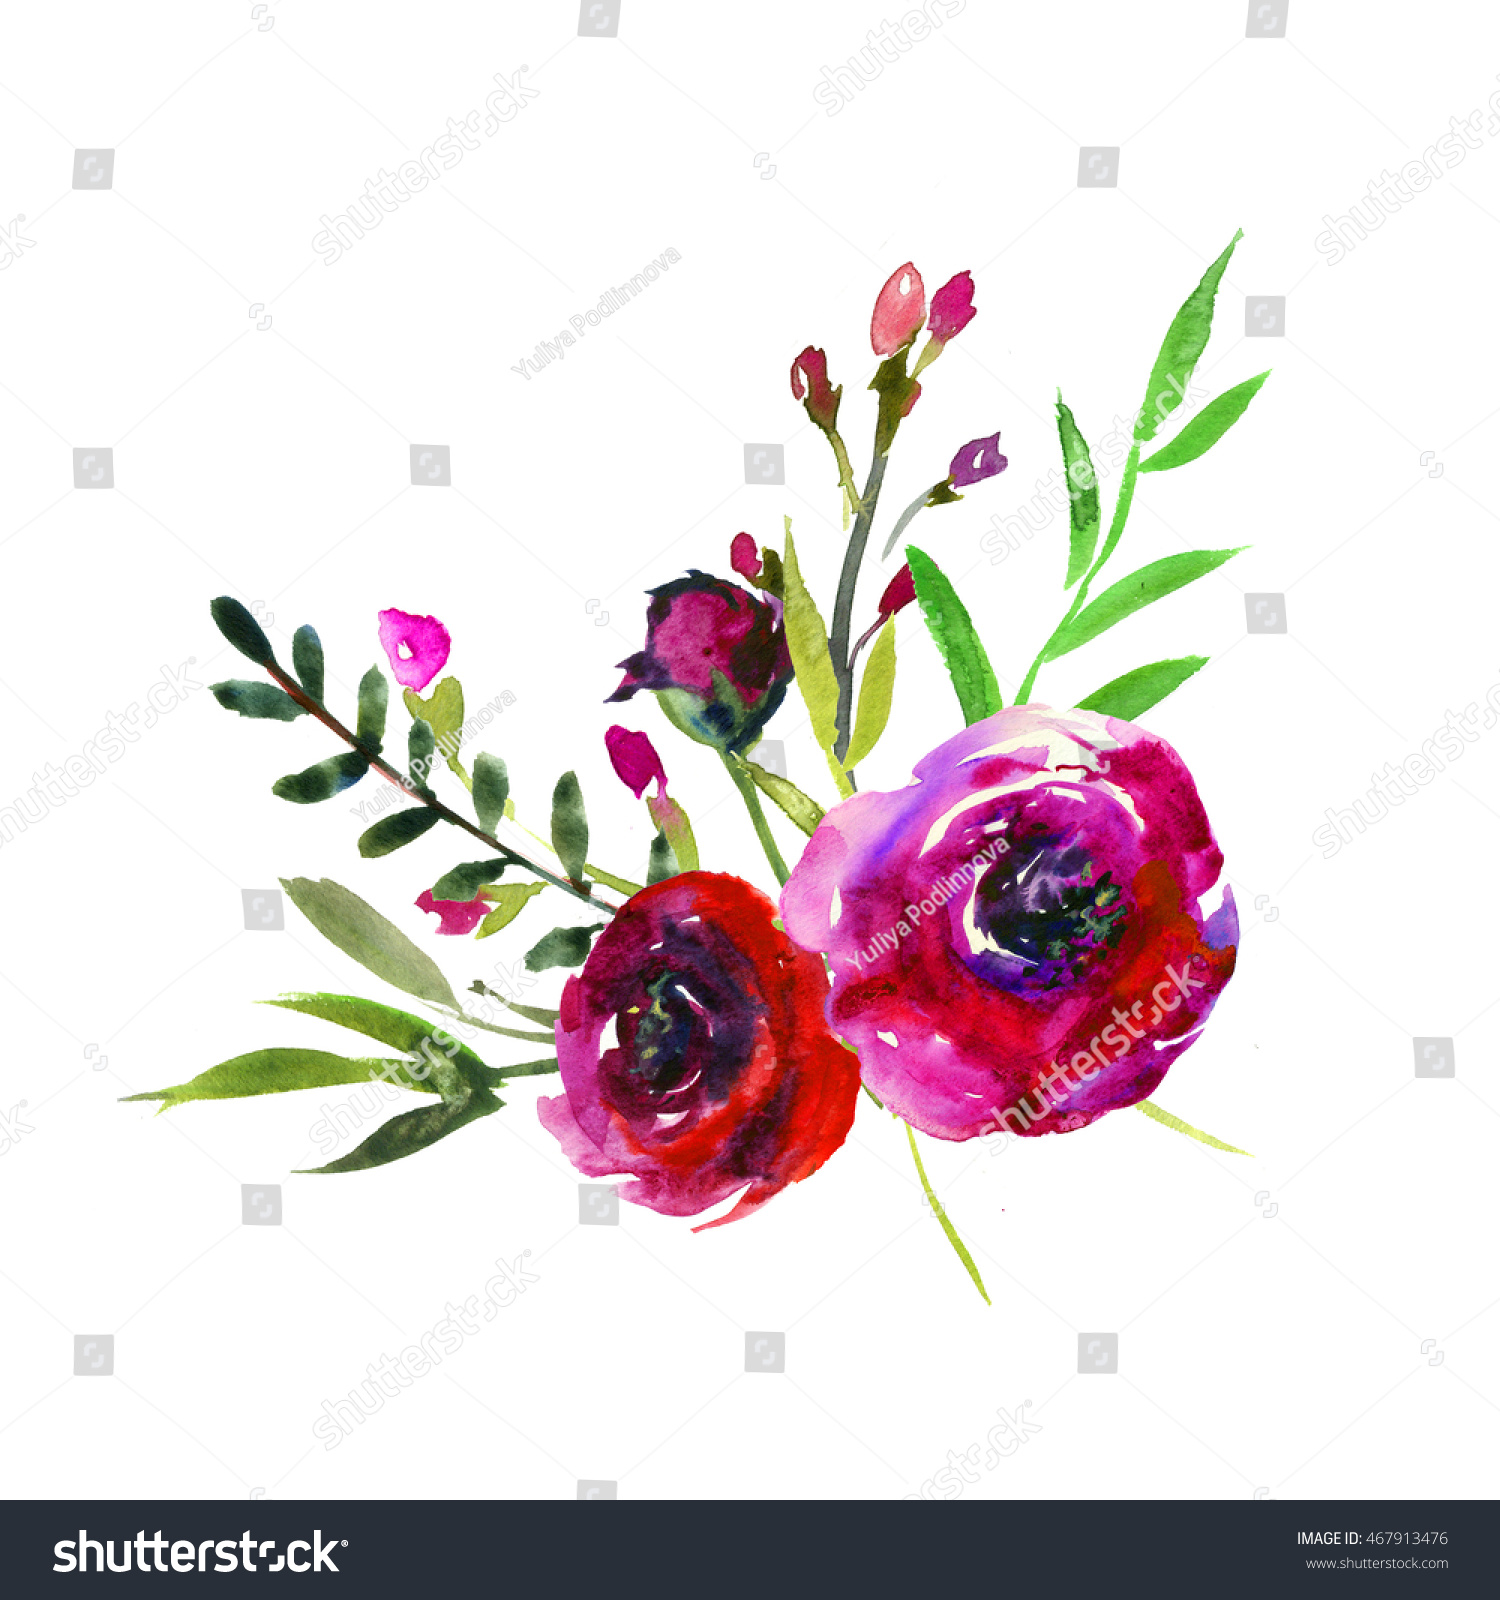 Watercolor Burgundy Flowers Arrangement Isolated Stock